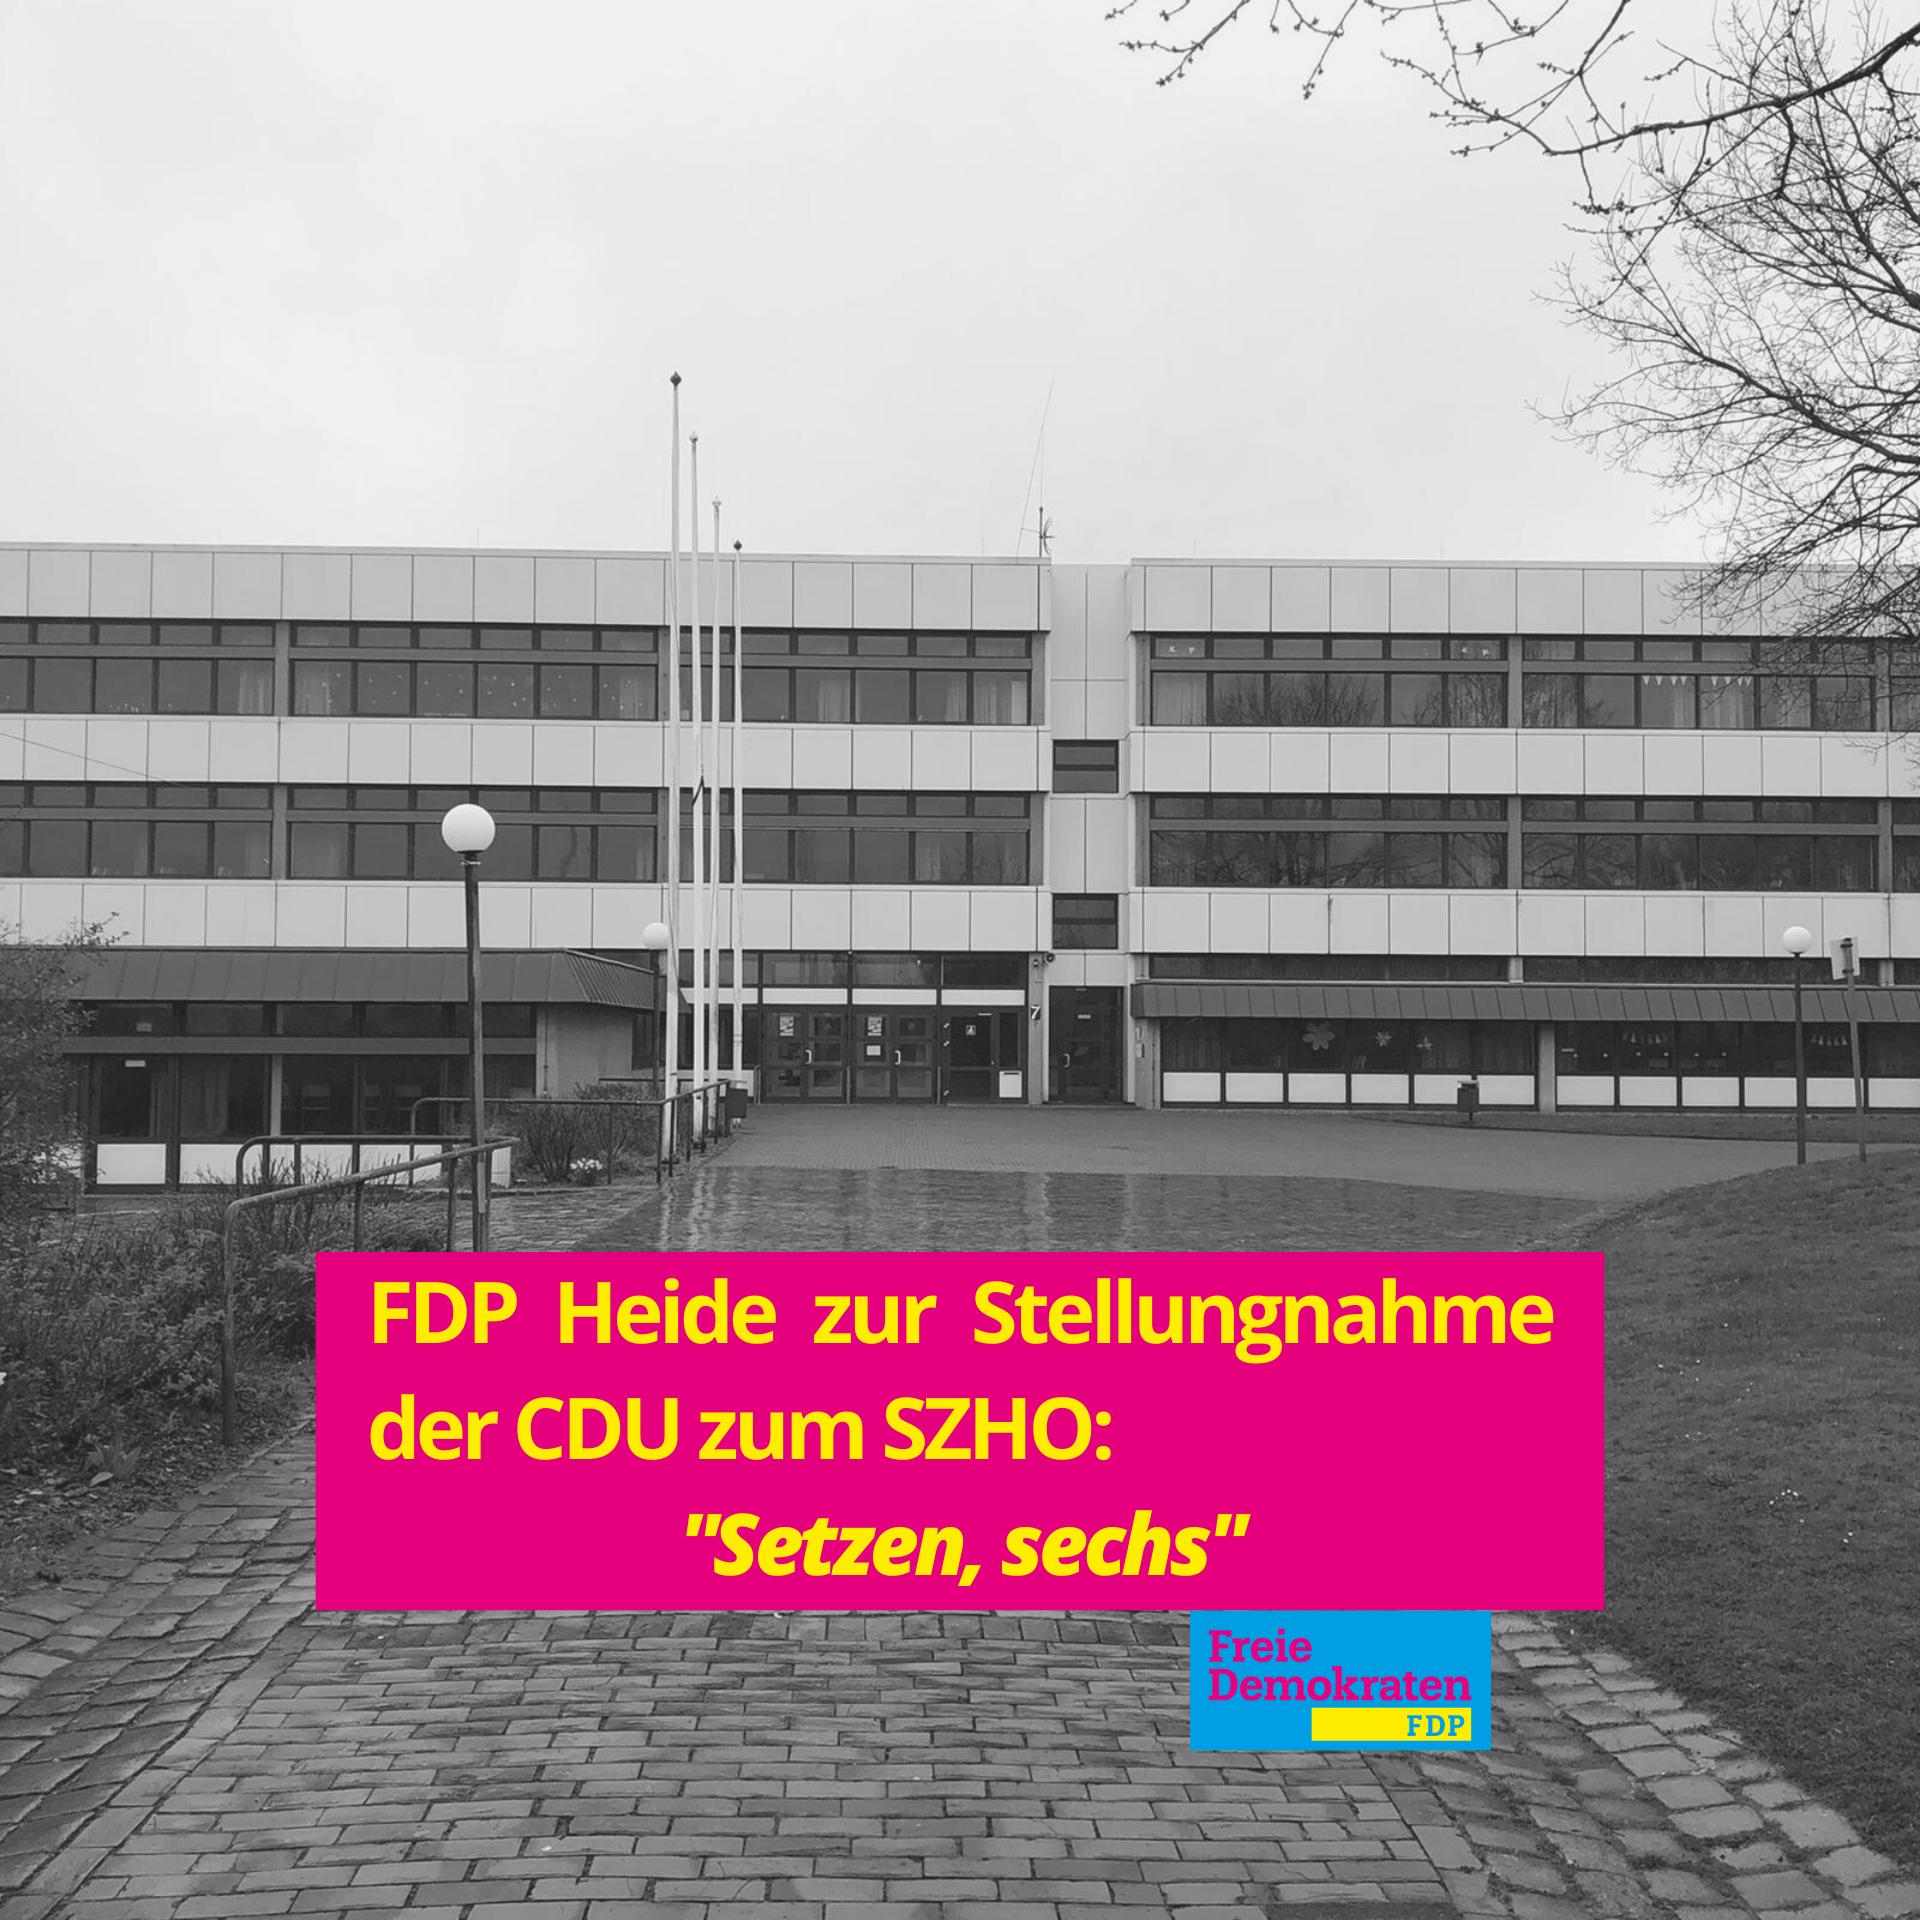 "FDP Heide zur Stellungnahme der CDU zum SZHO: ""Setzen, sechs!"""